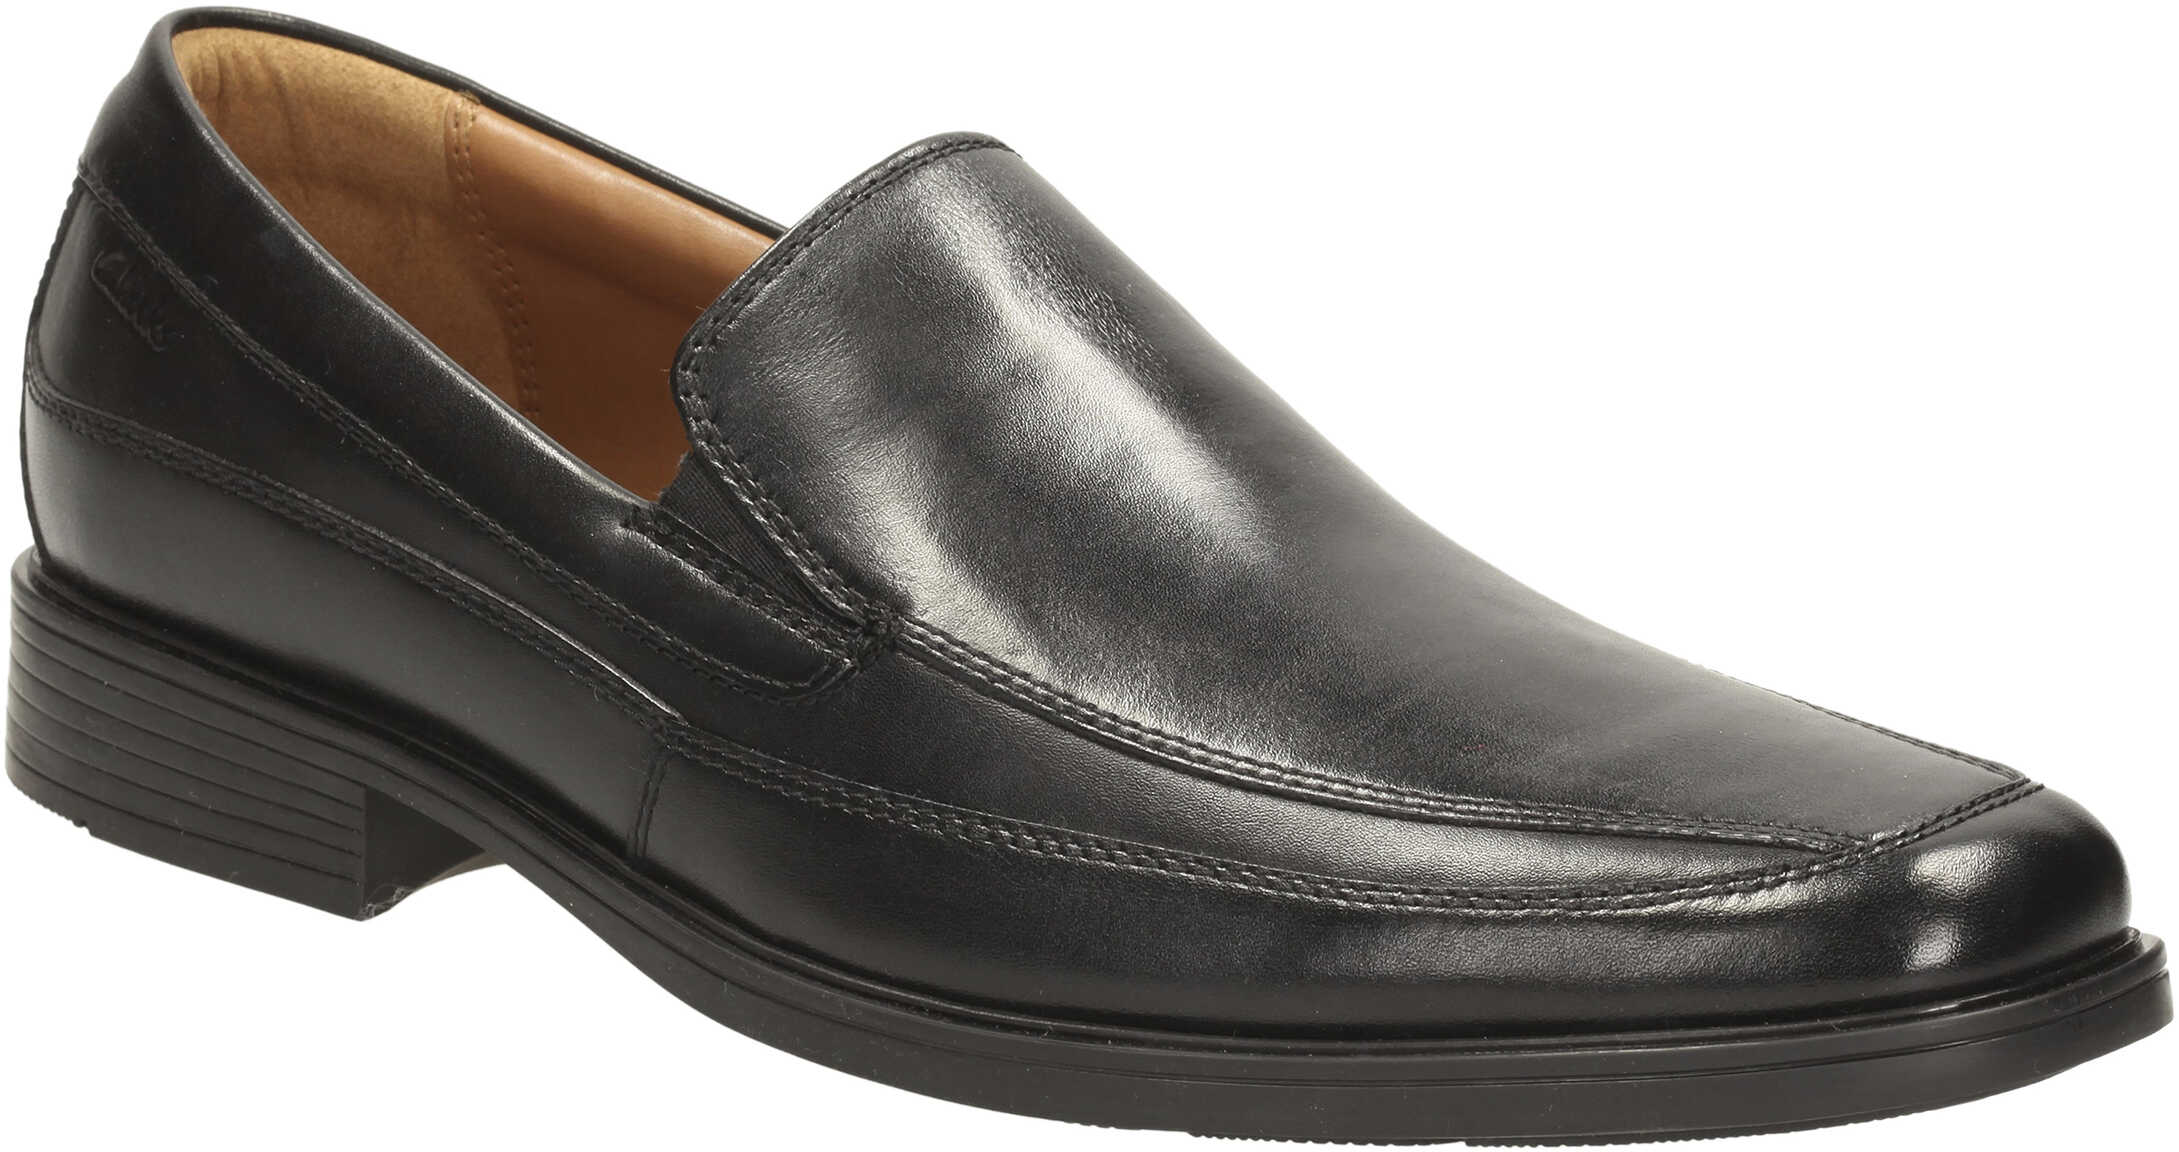 Clarks Tilden Free* Black Leather